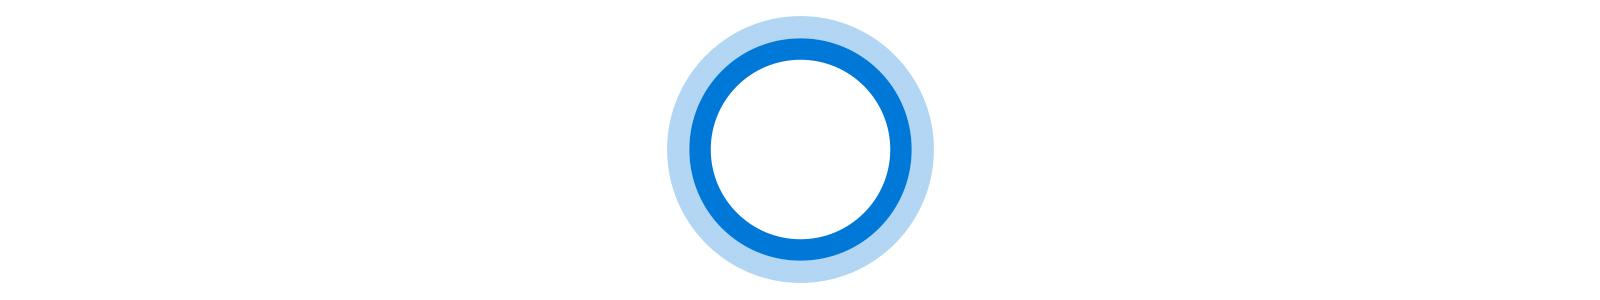 Cortana 动画图标